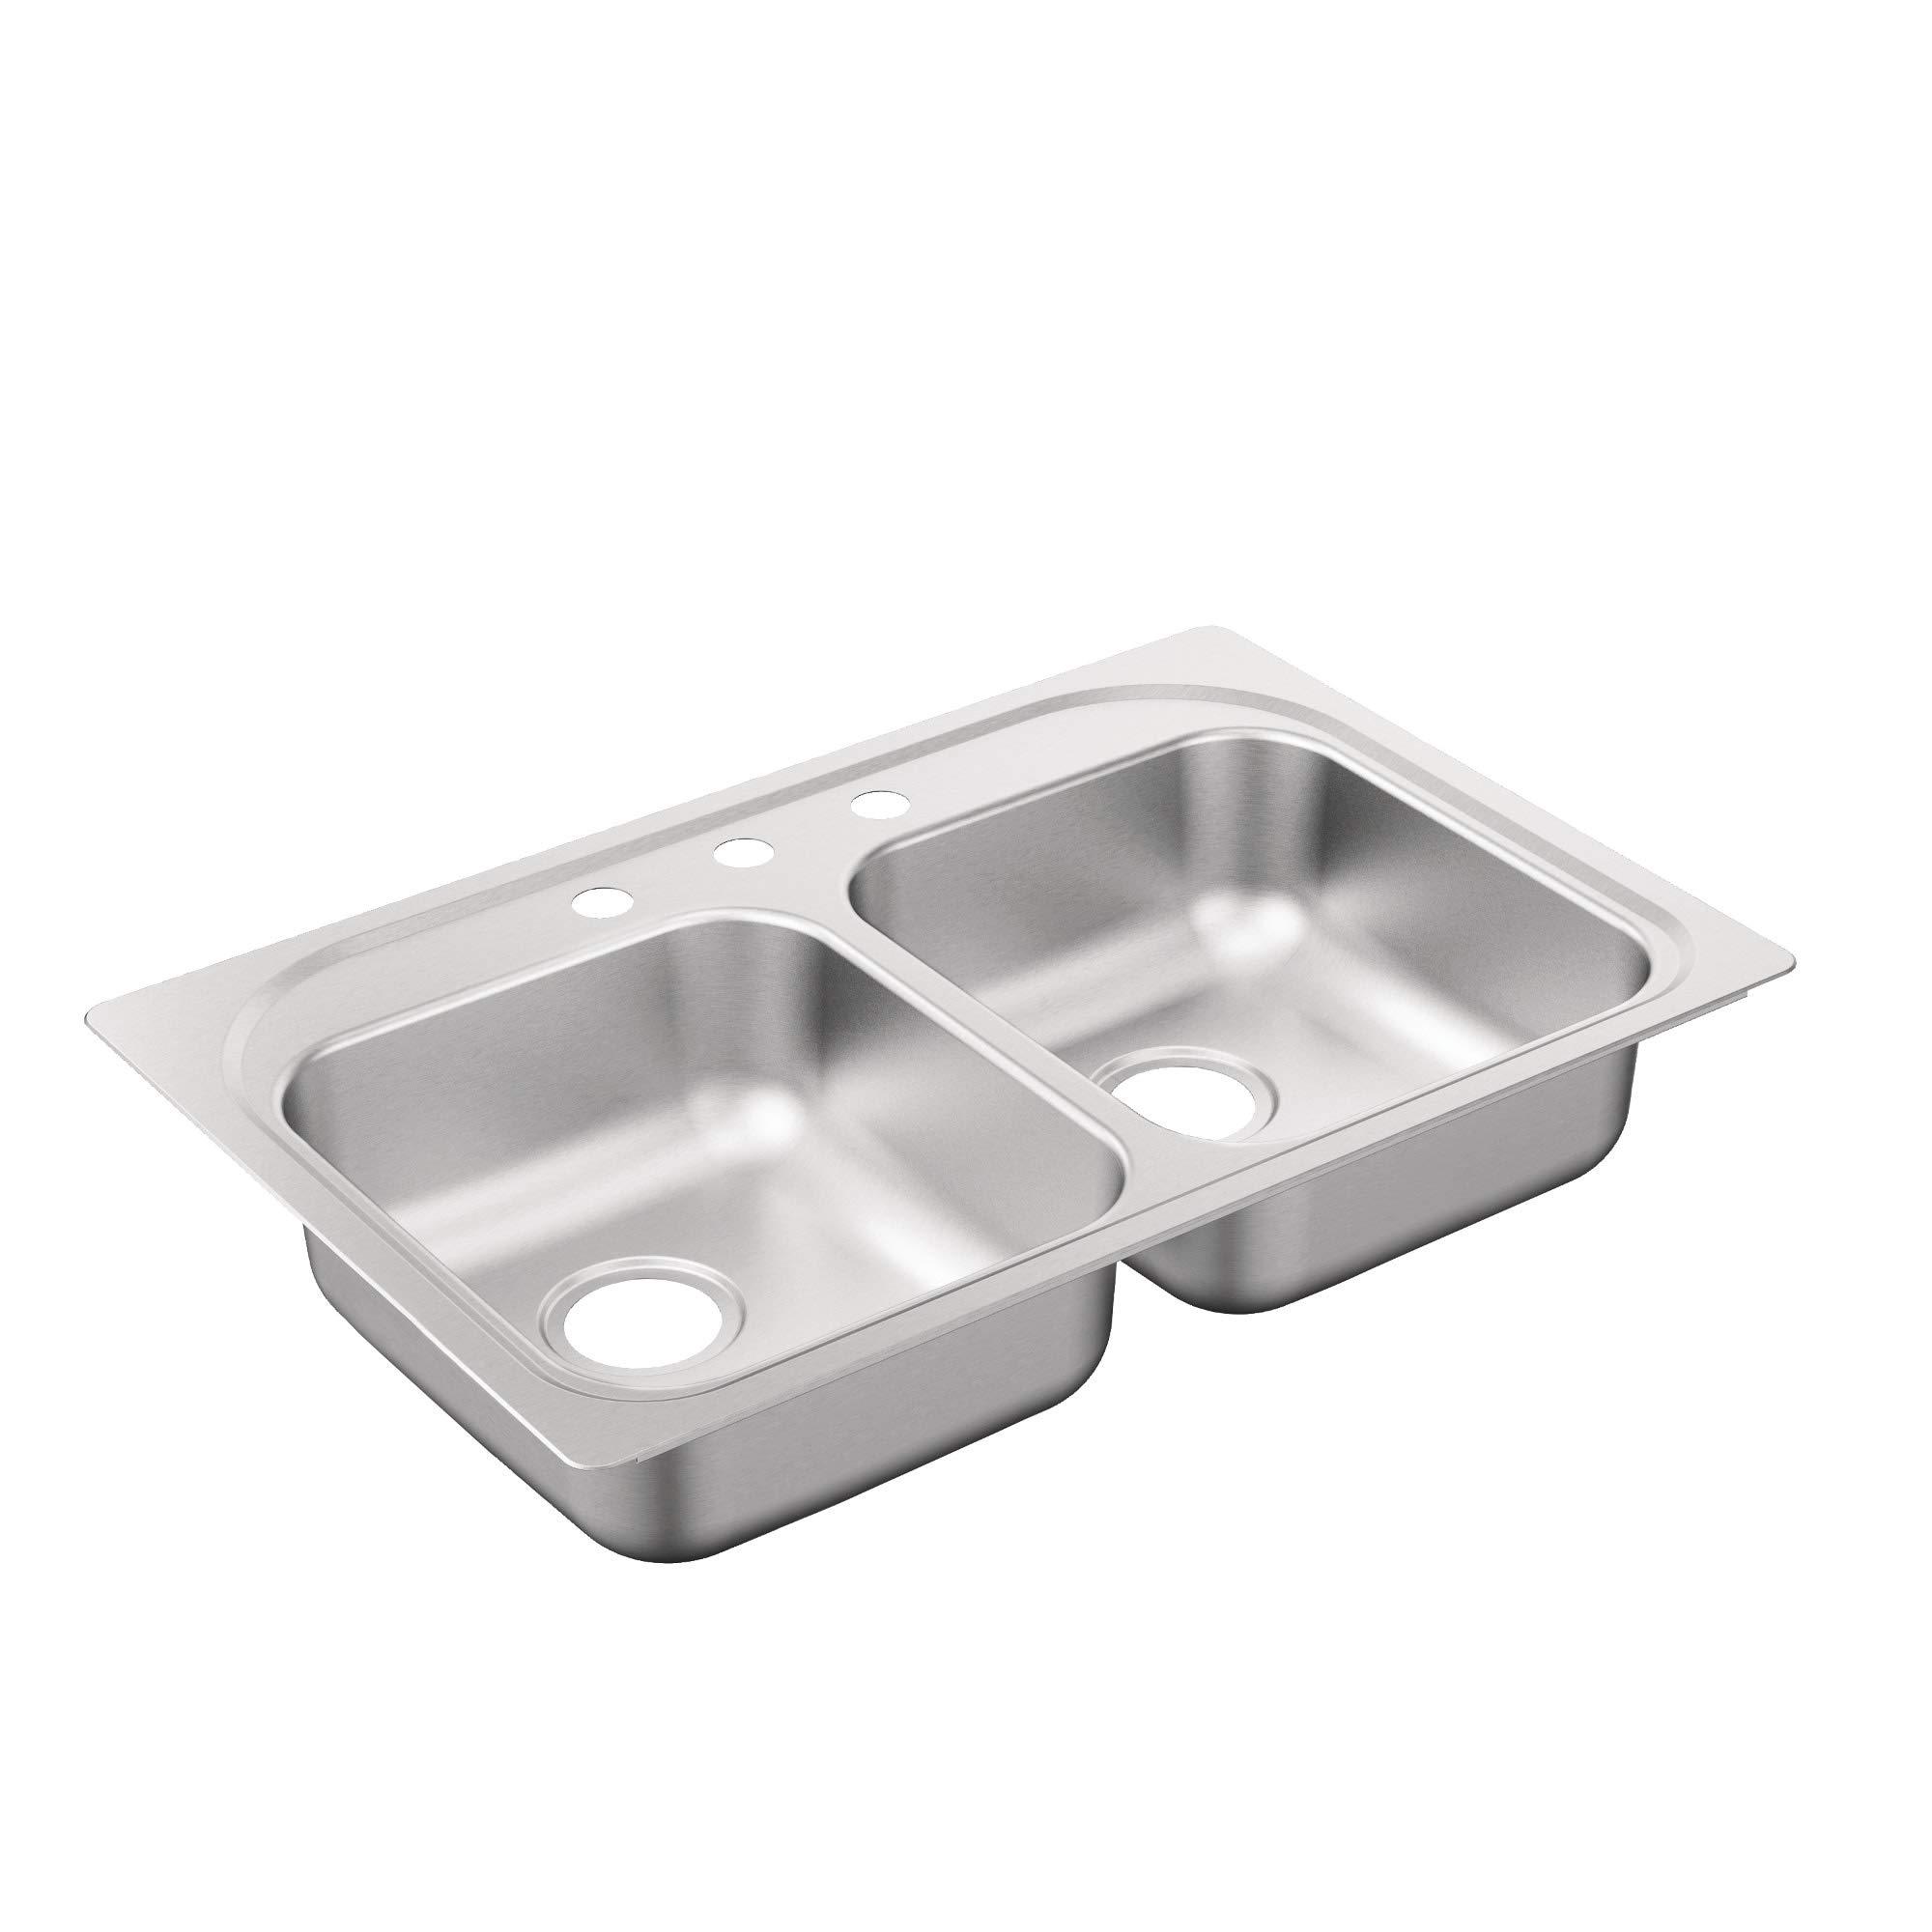 Moen G222163B 2200 Series Sink Brushed/Satin Stainless